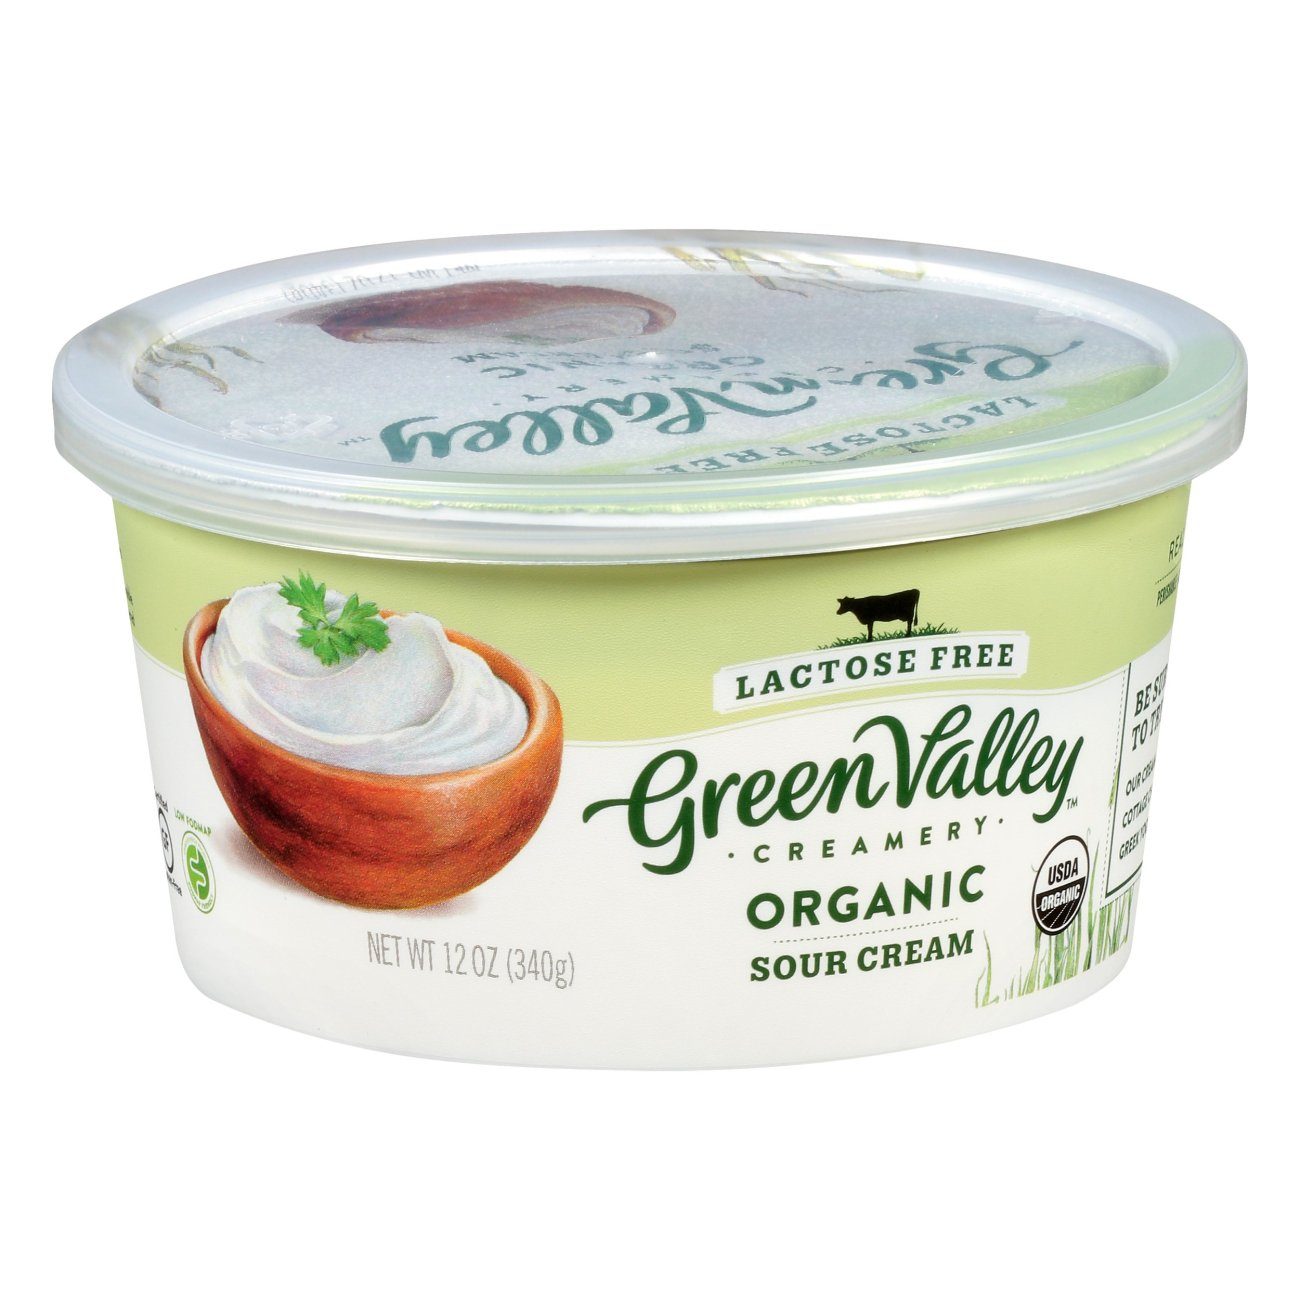 Green Valley Creamery Organic Sour Cream Shop Sour Cream At H E B